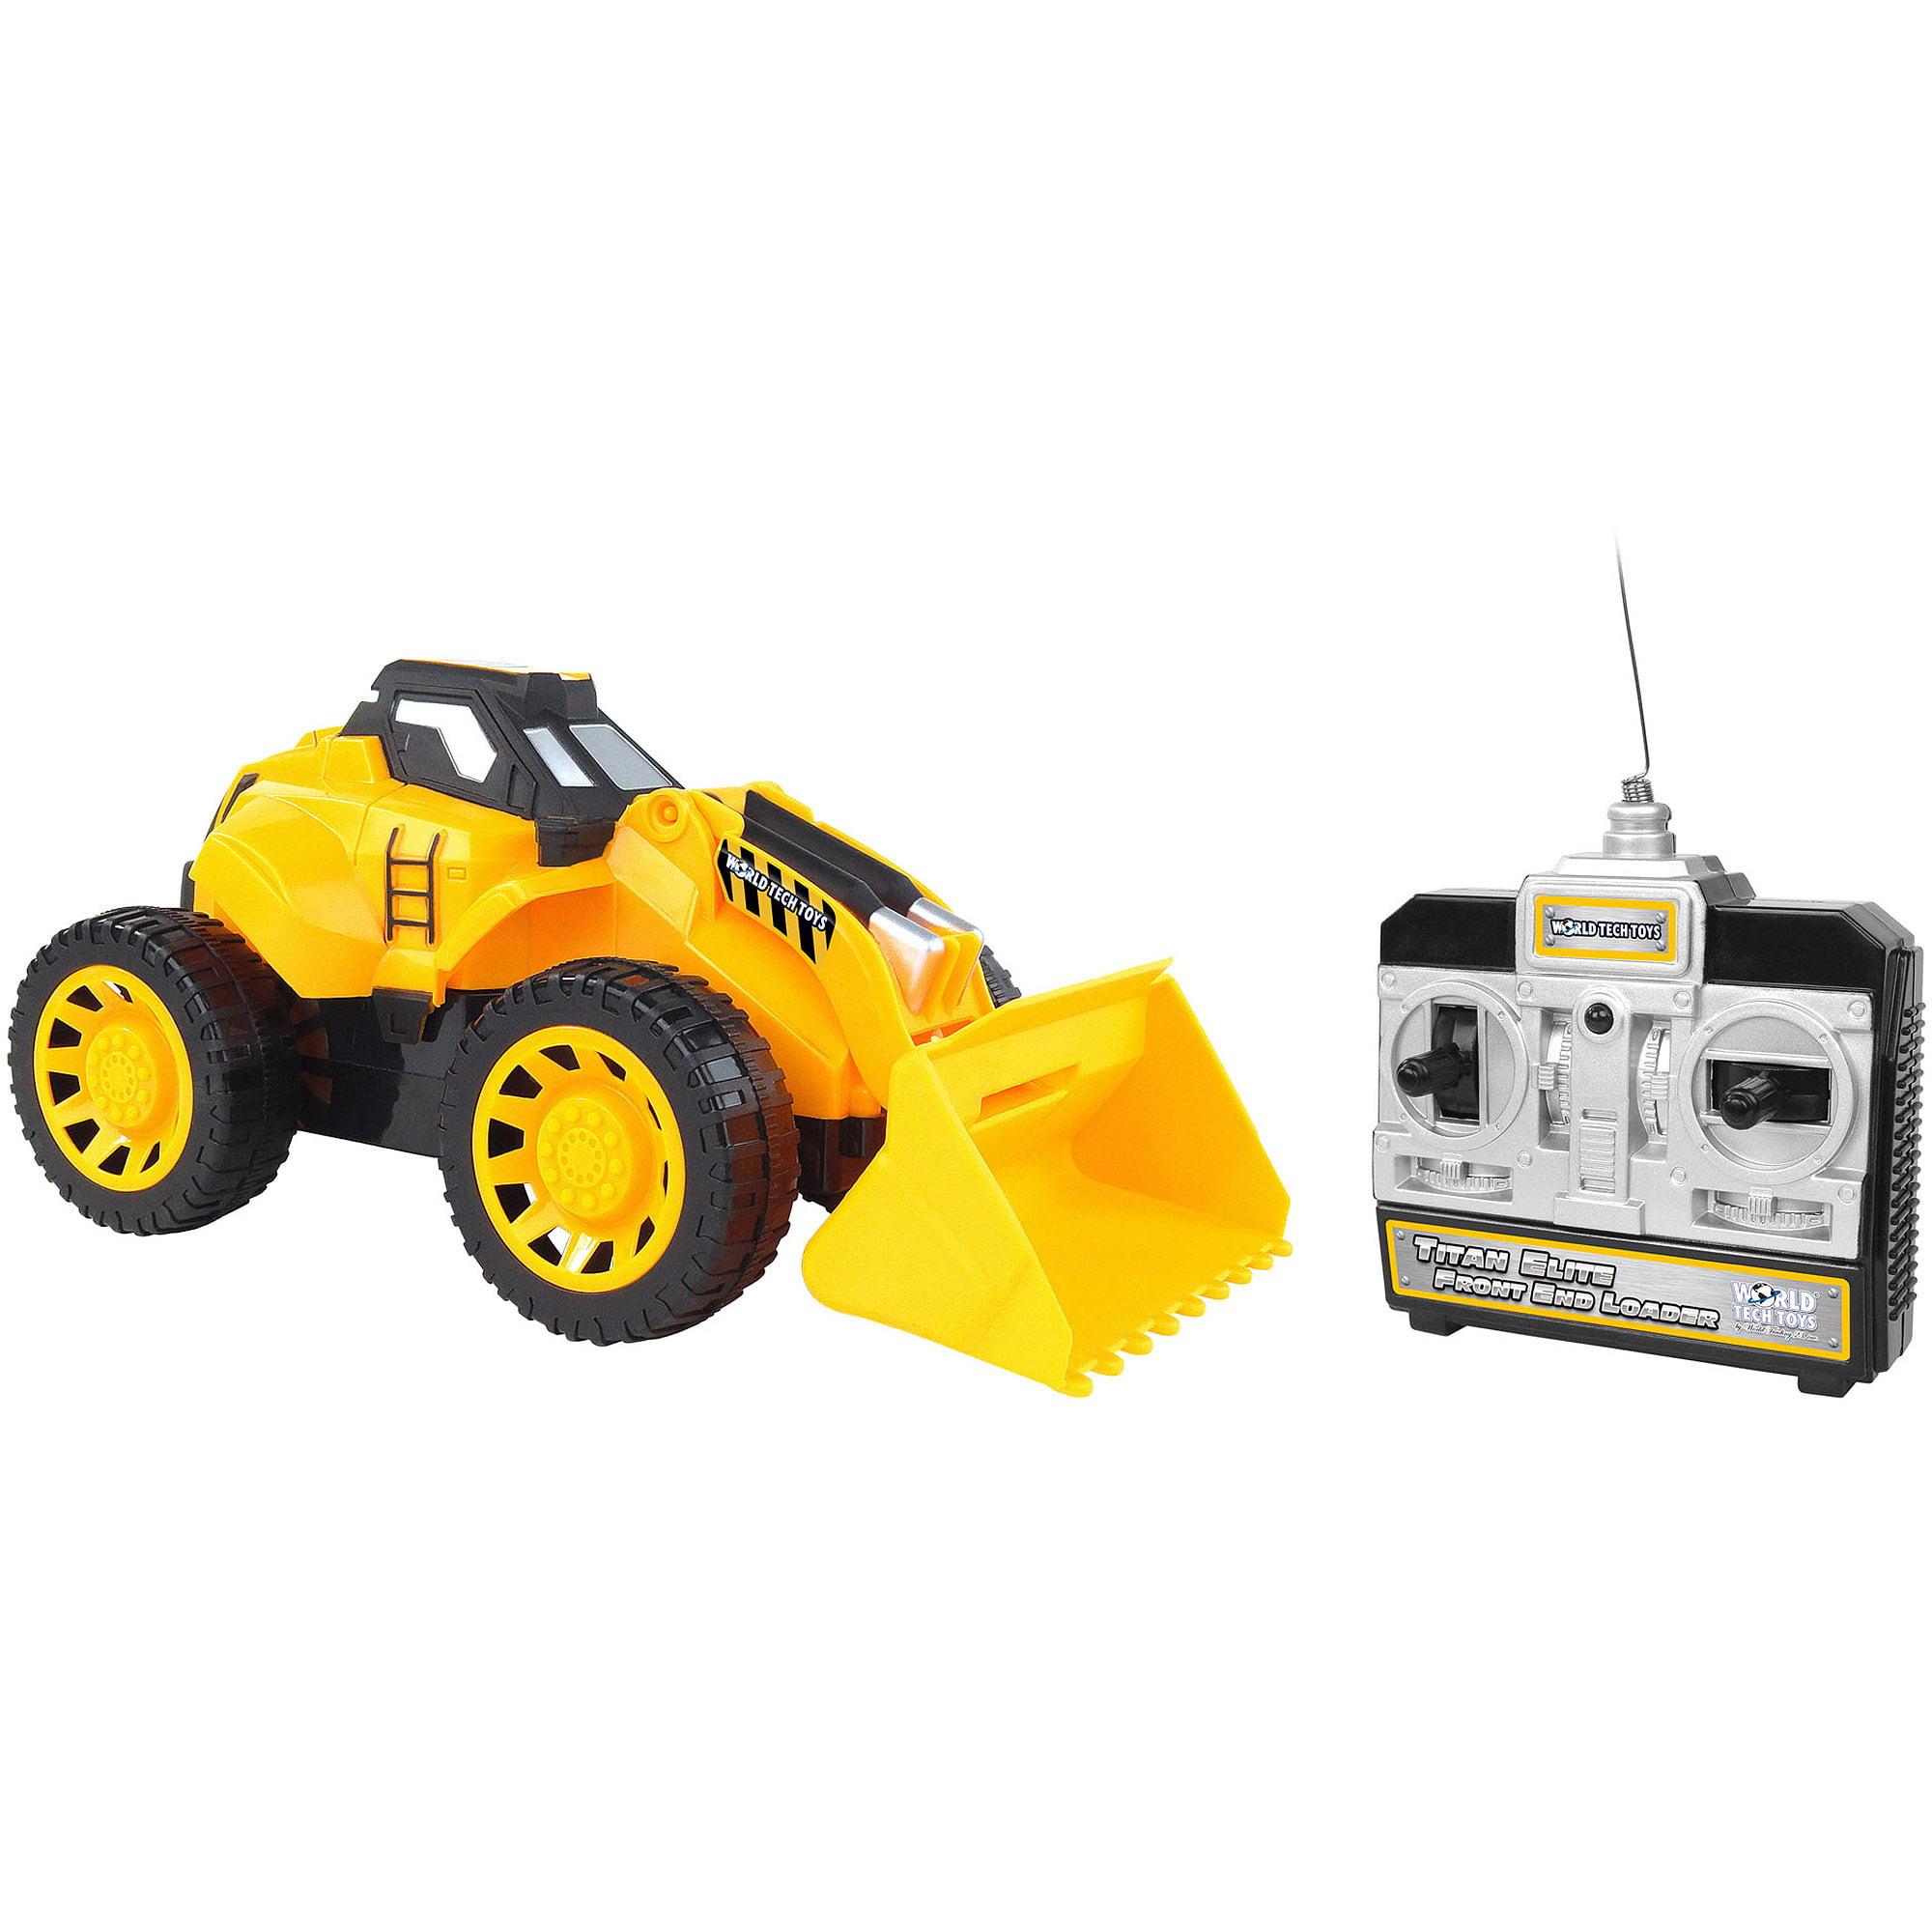 World Tech Toys Titan Elite Front End Loader RC Construction Vehicle